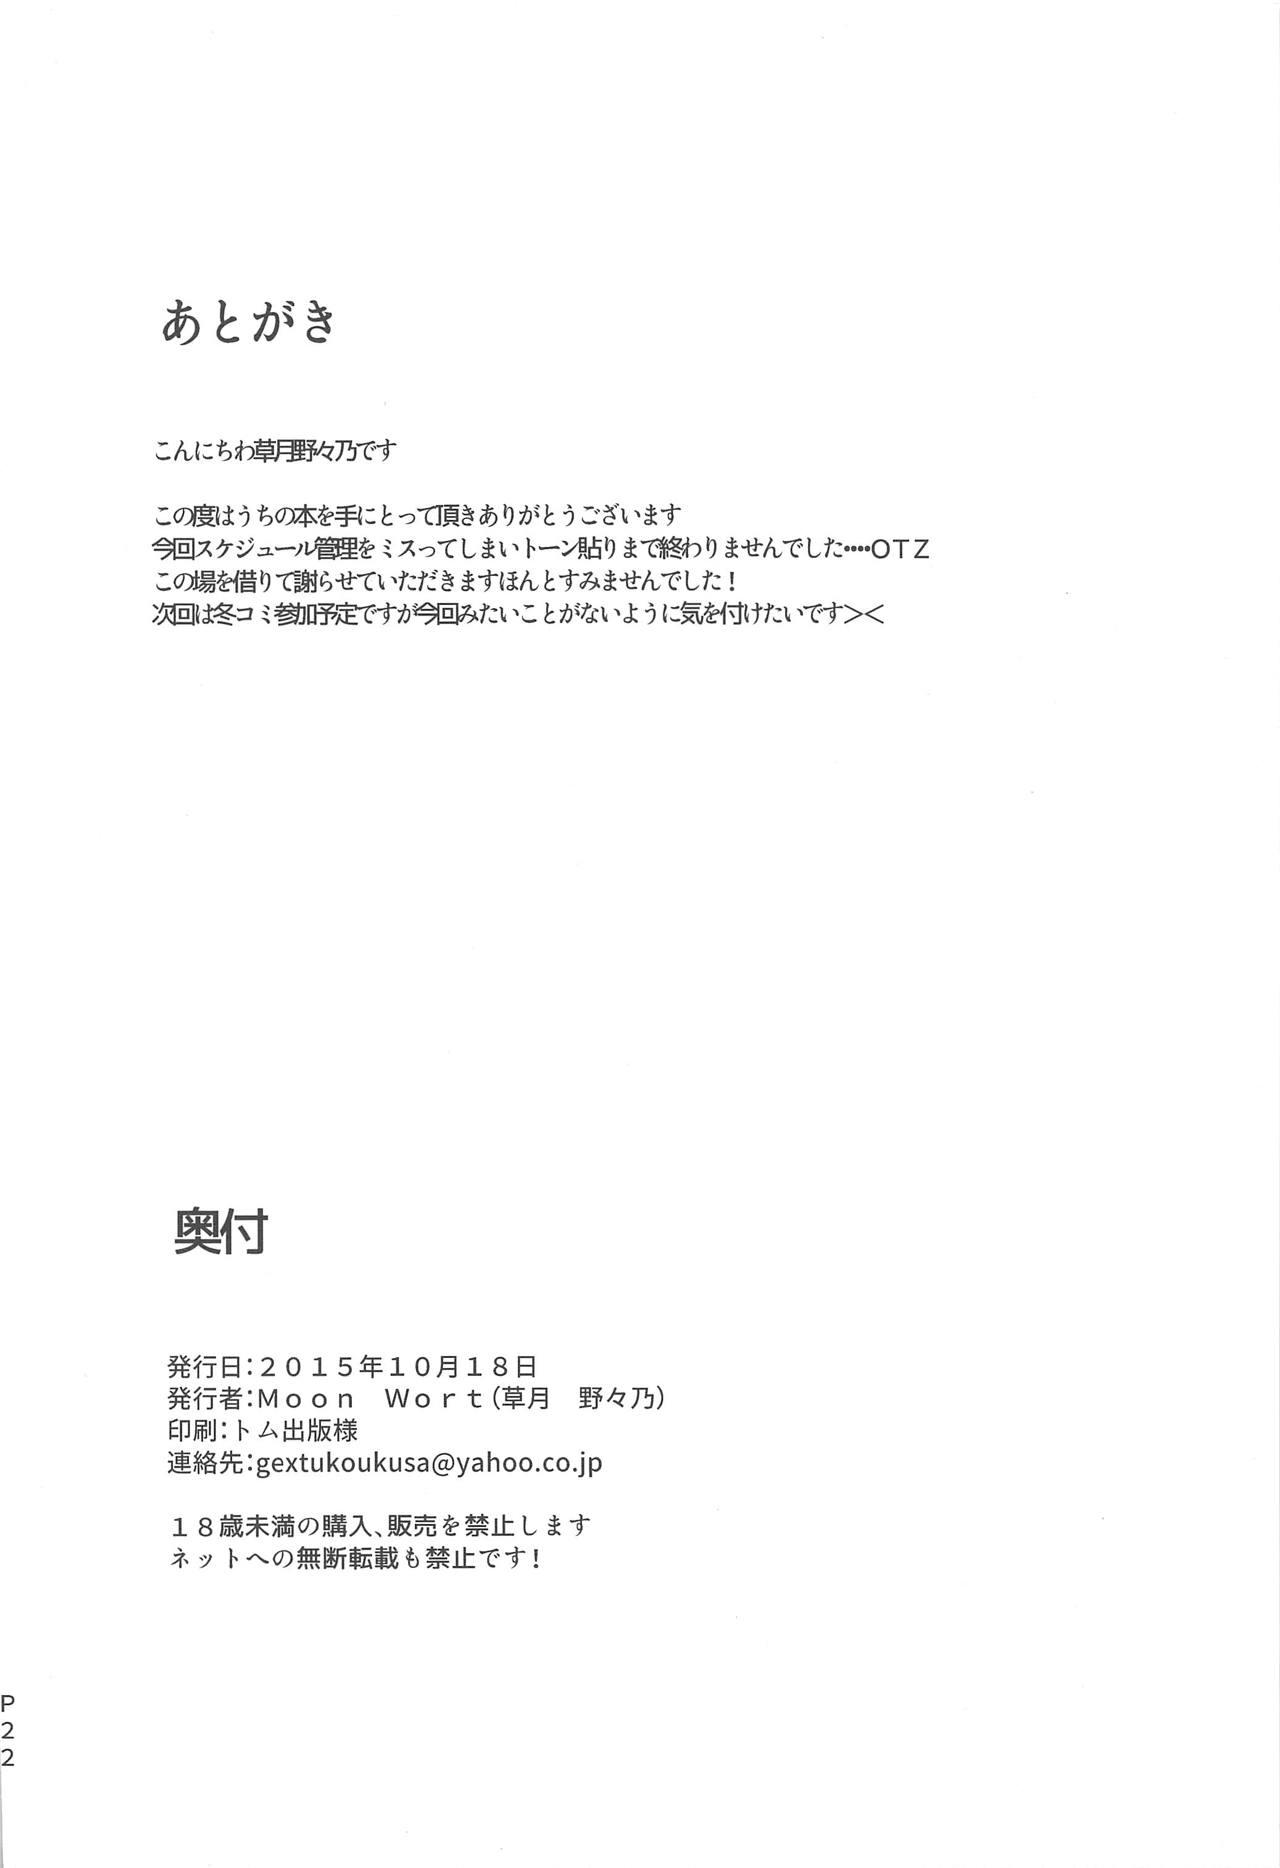 Koishi-chan ga Muboubi Sugite Gaman Dekinakatta 18